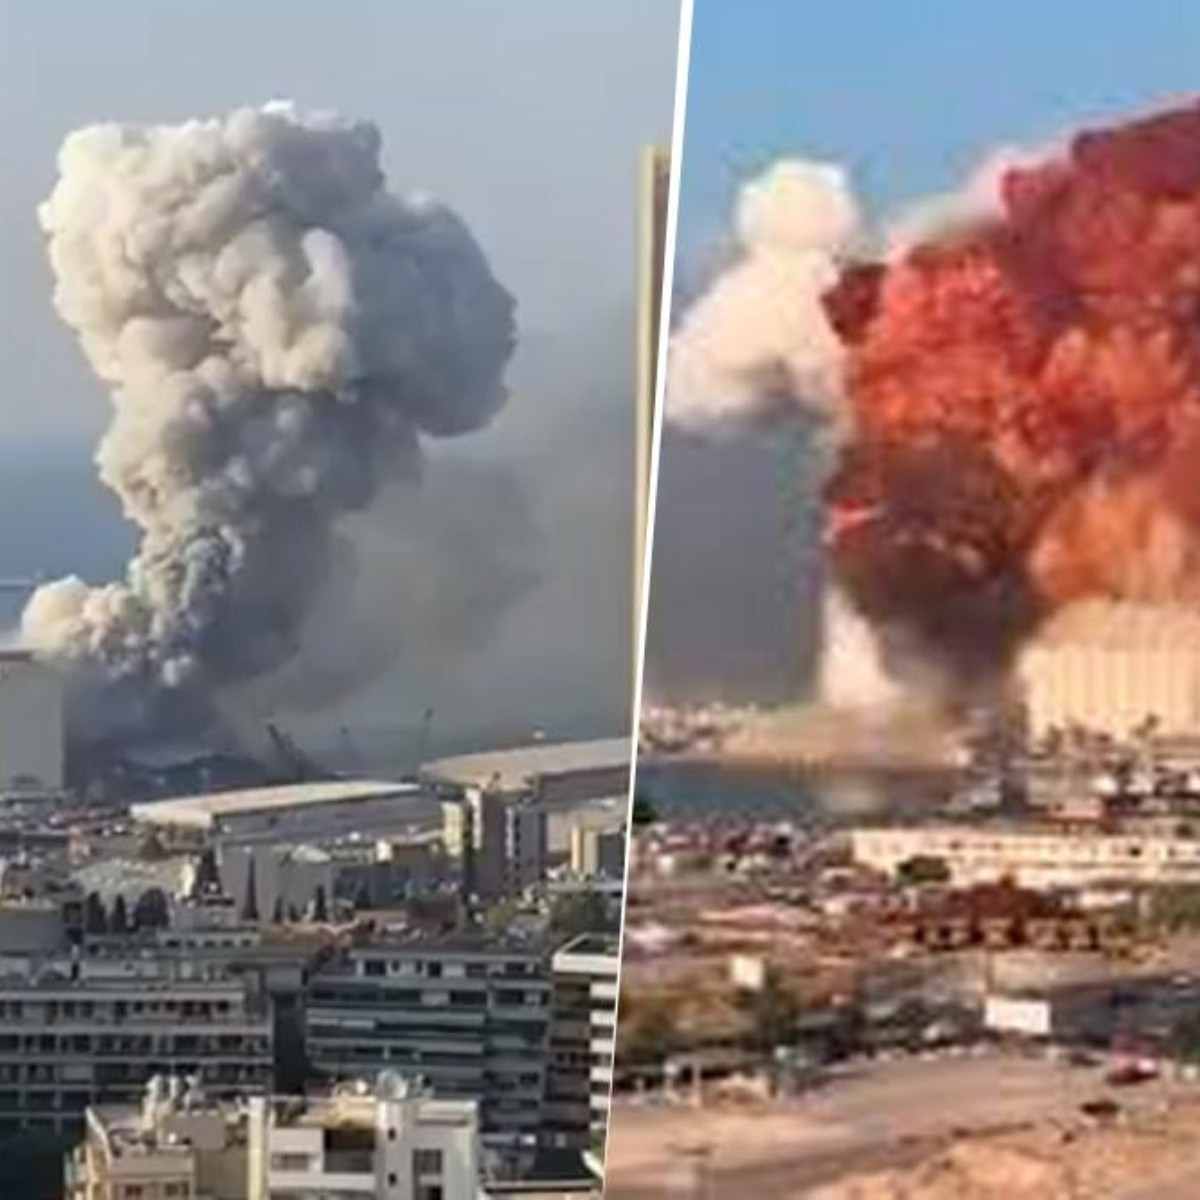 beirut_libano_explosion_video_que_ocurrio_crop1596557783664.jpg_423682103